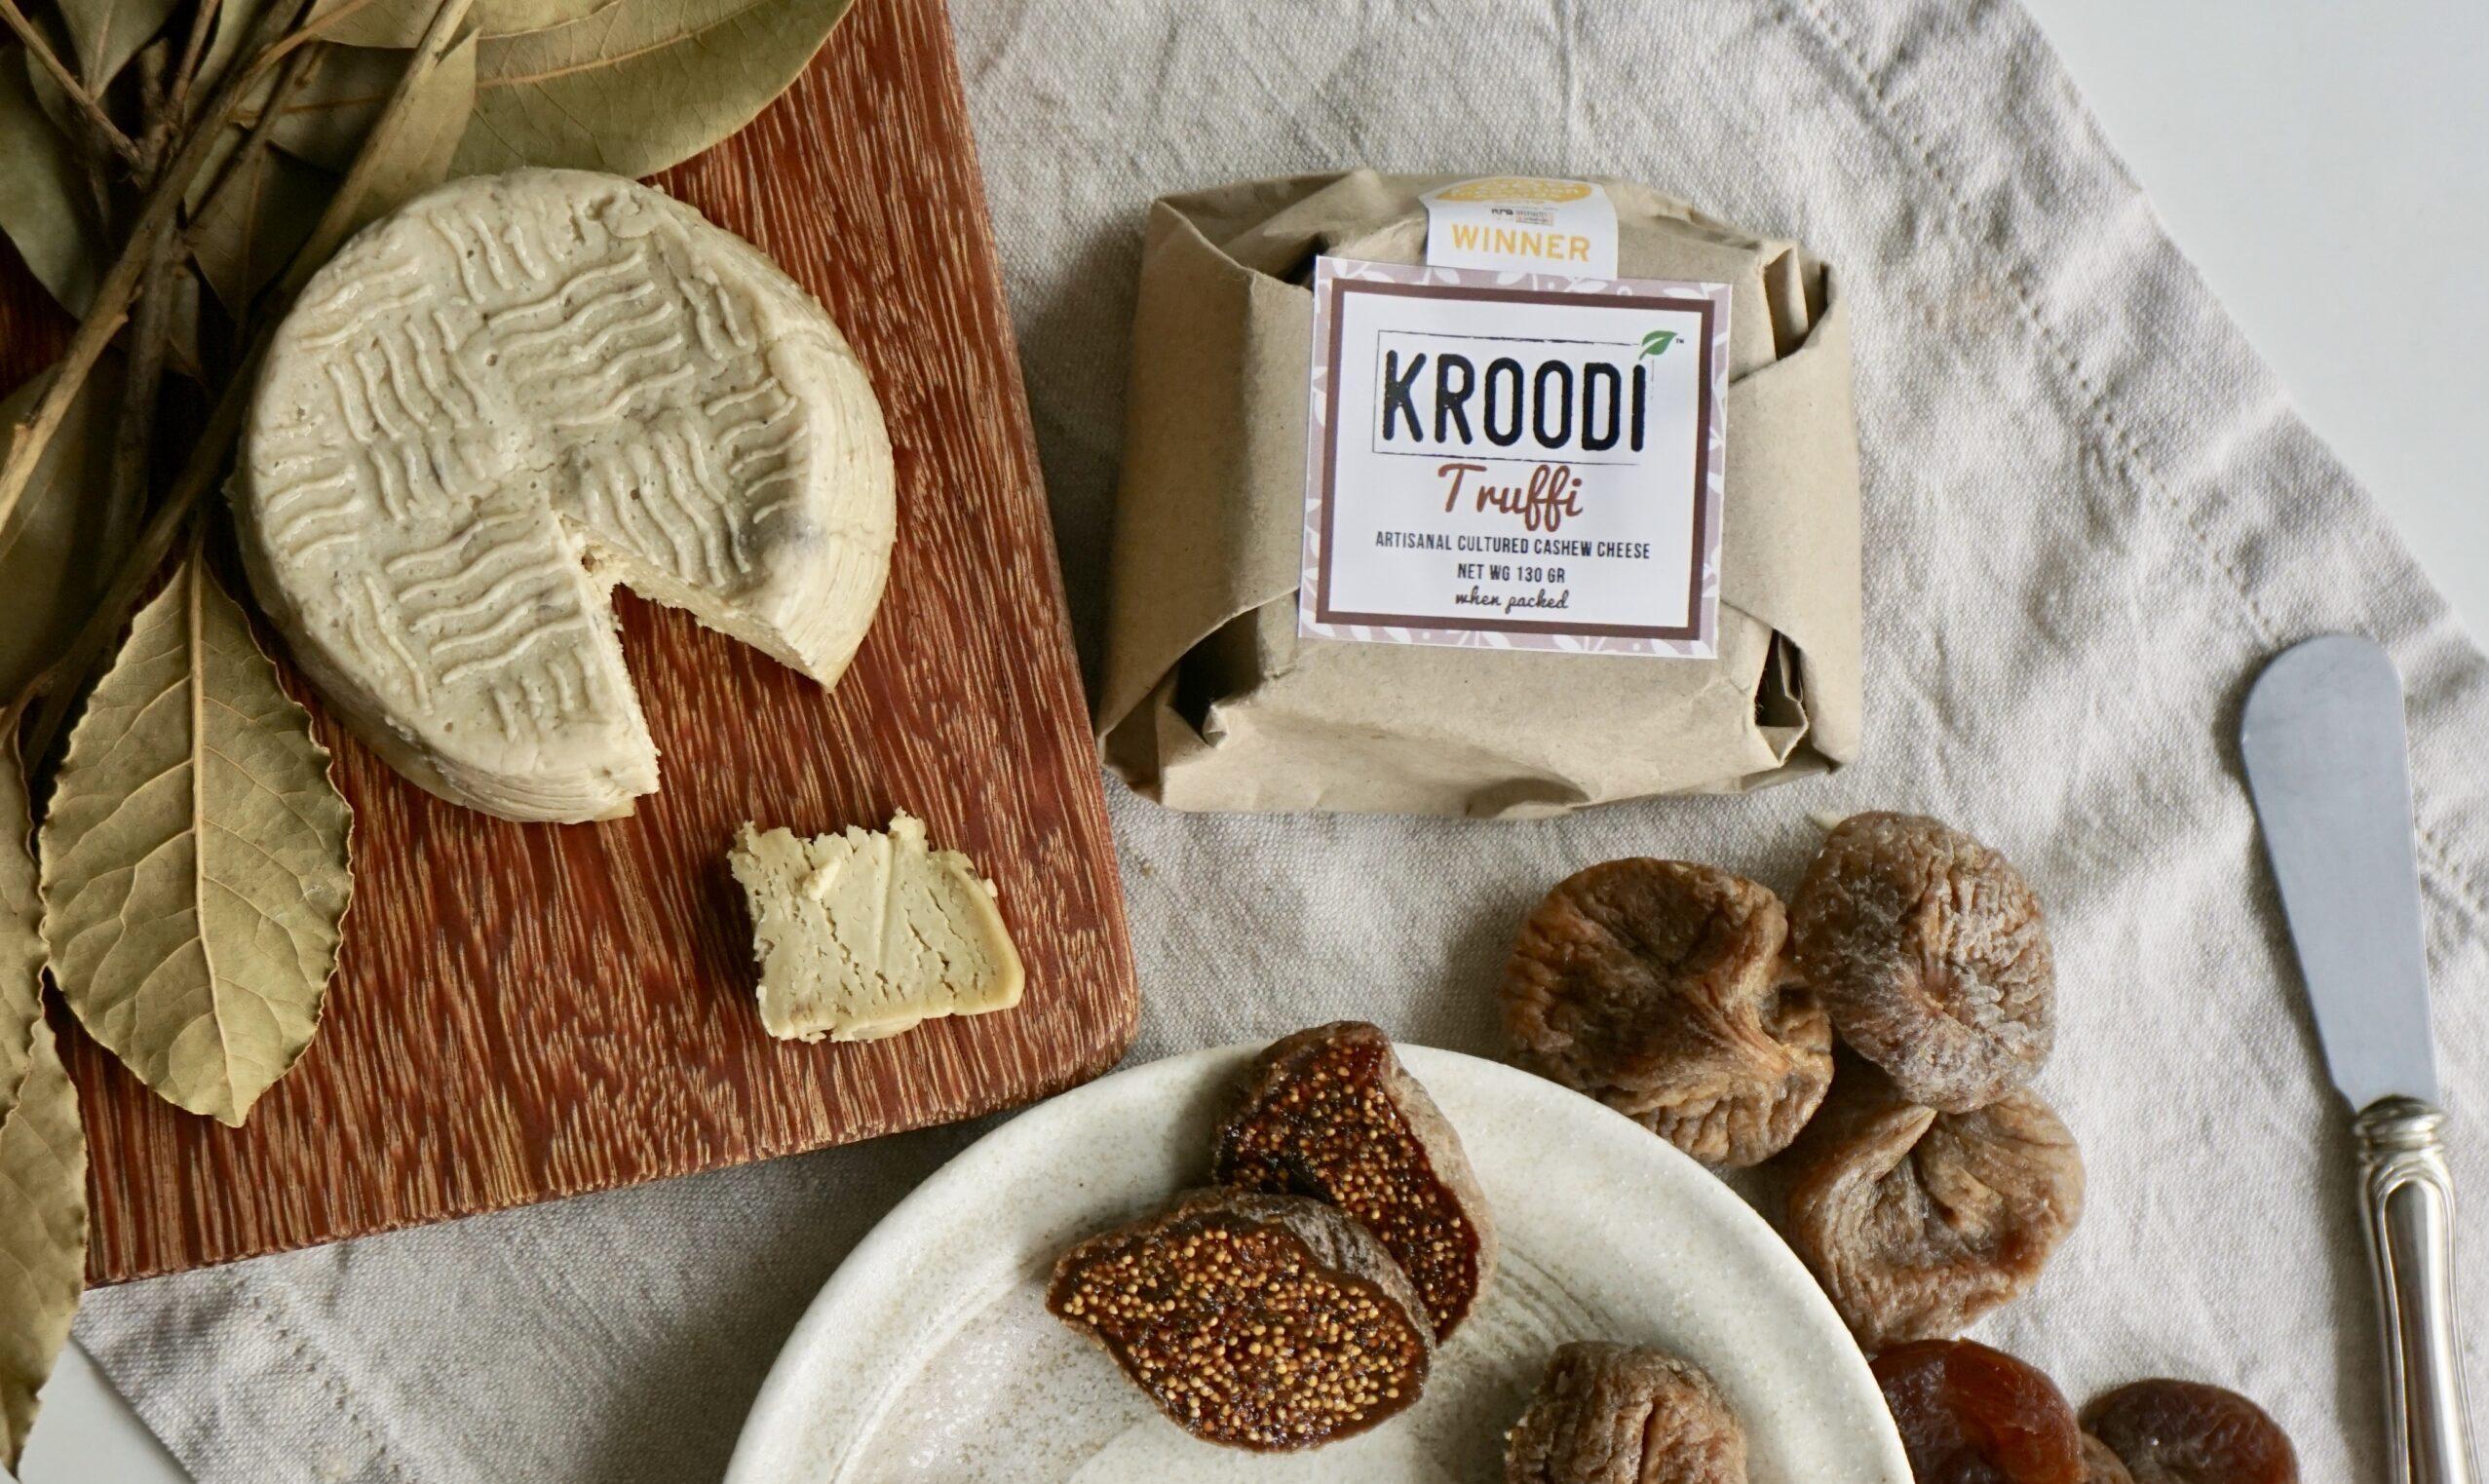 kroodi cheese